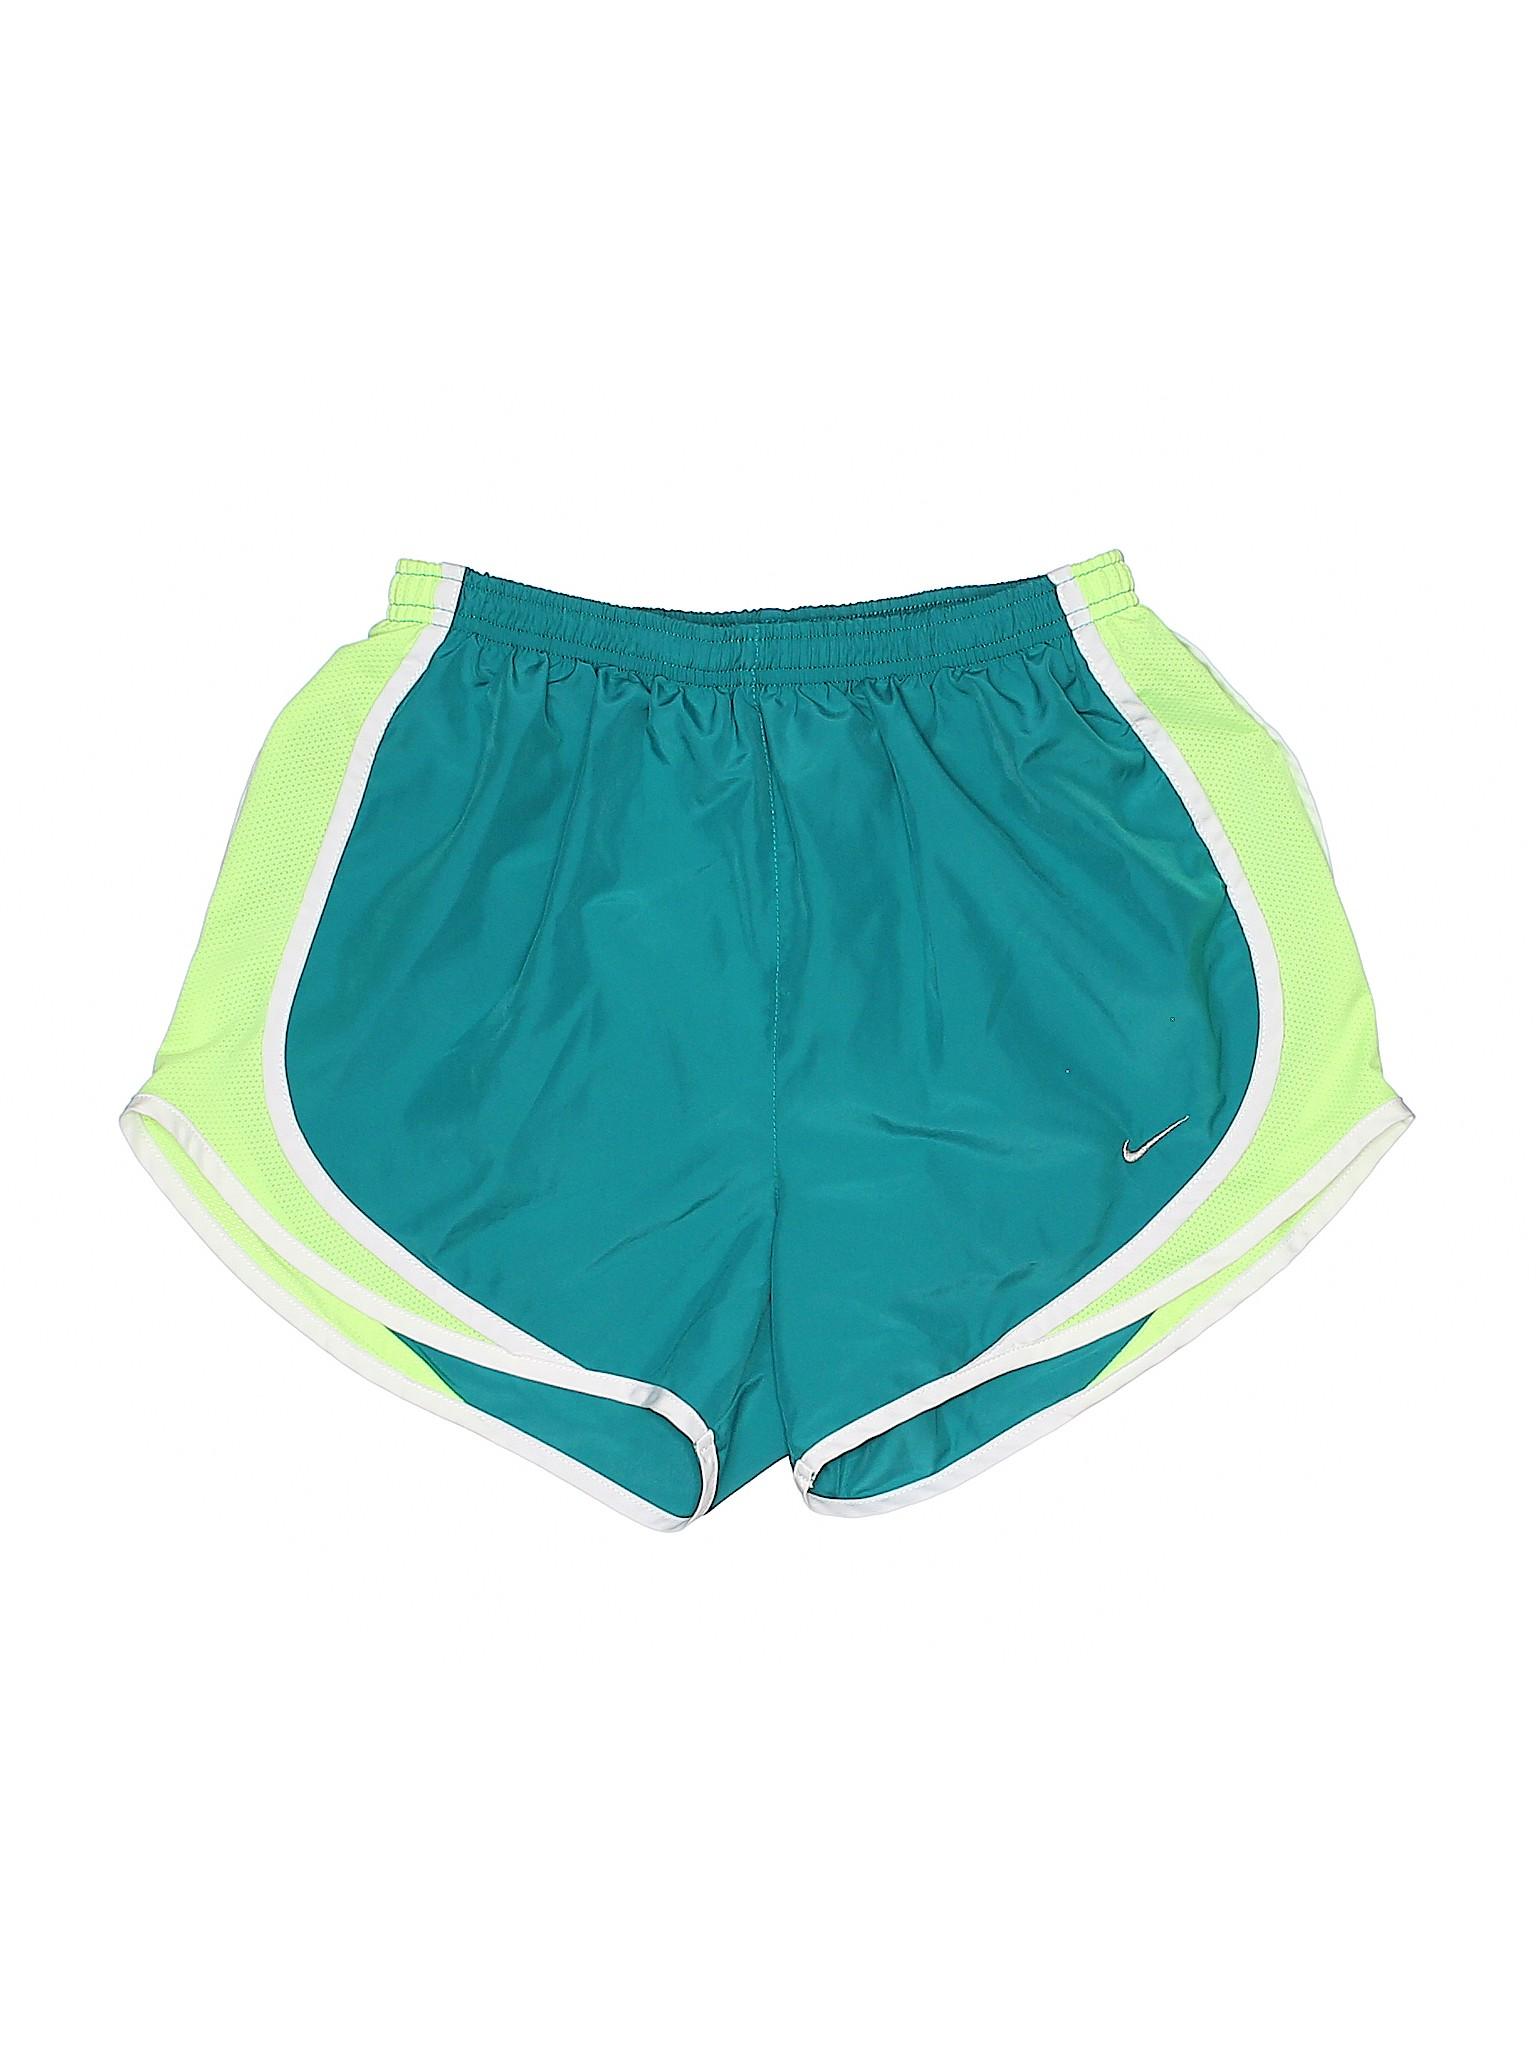 Boutique Nike Nike Boutique Athletic Shorts rvrfqa